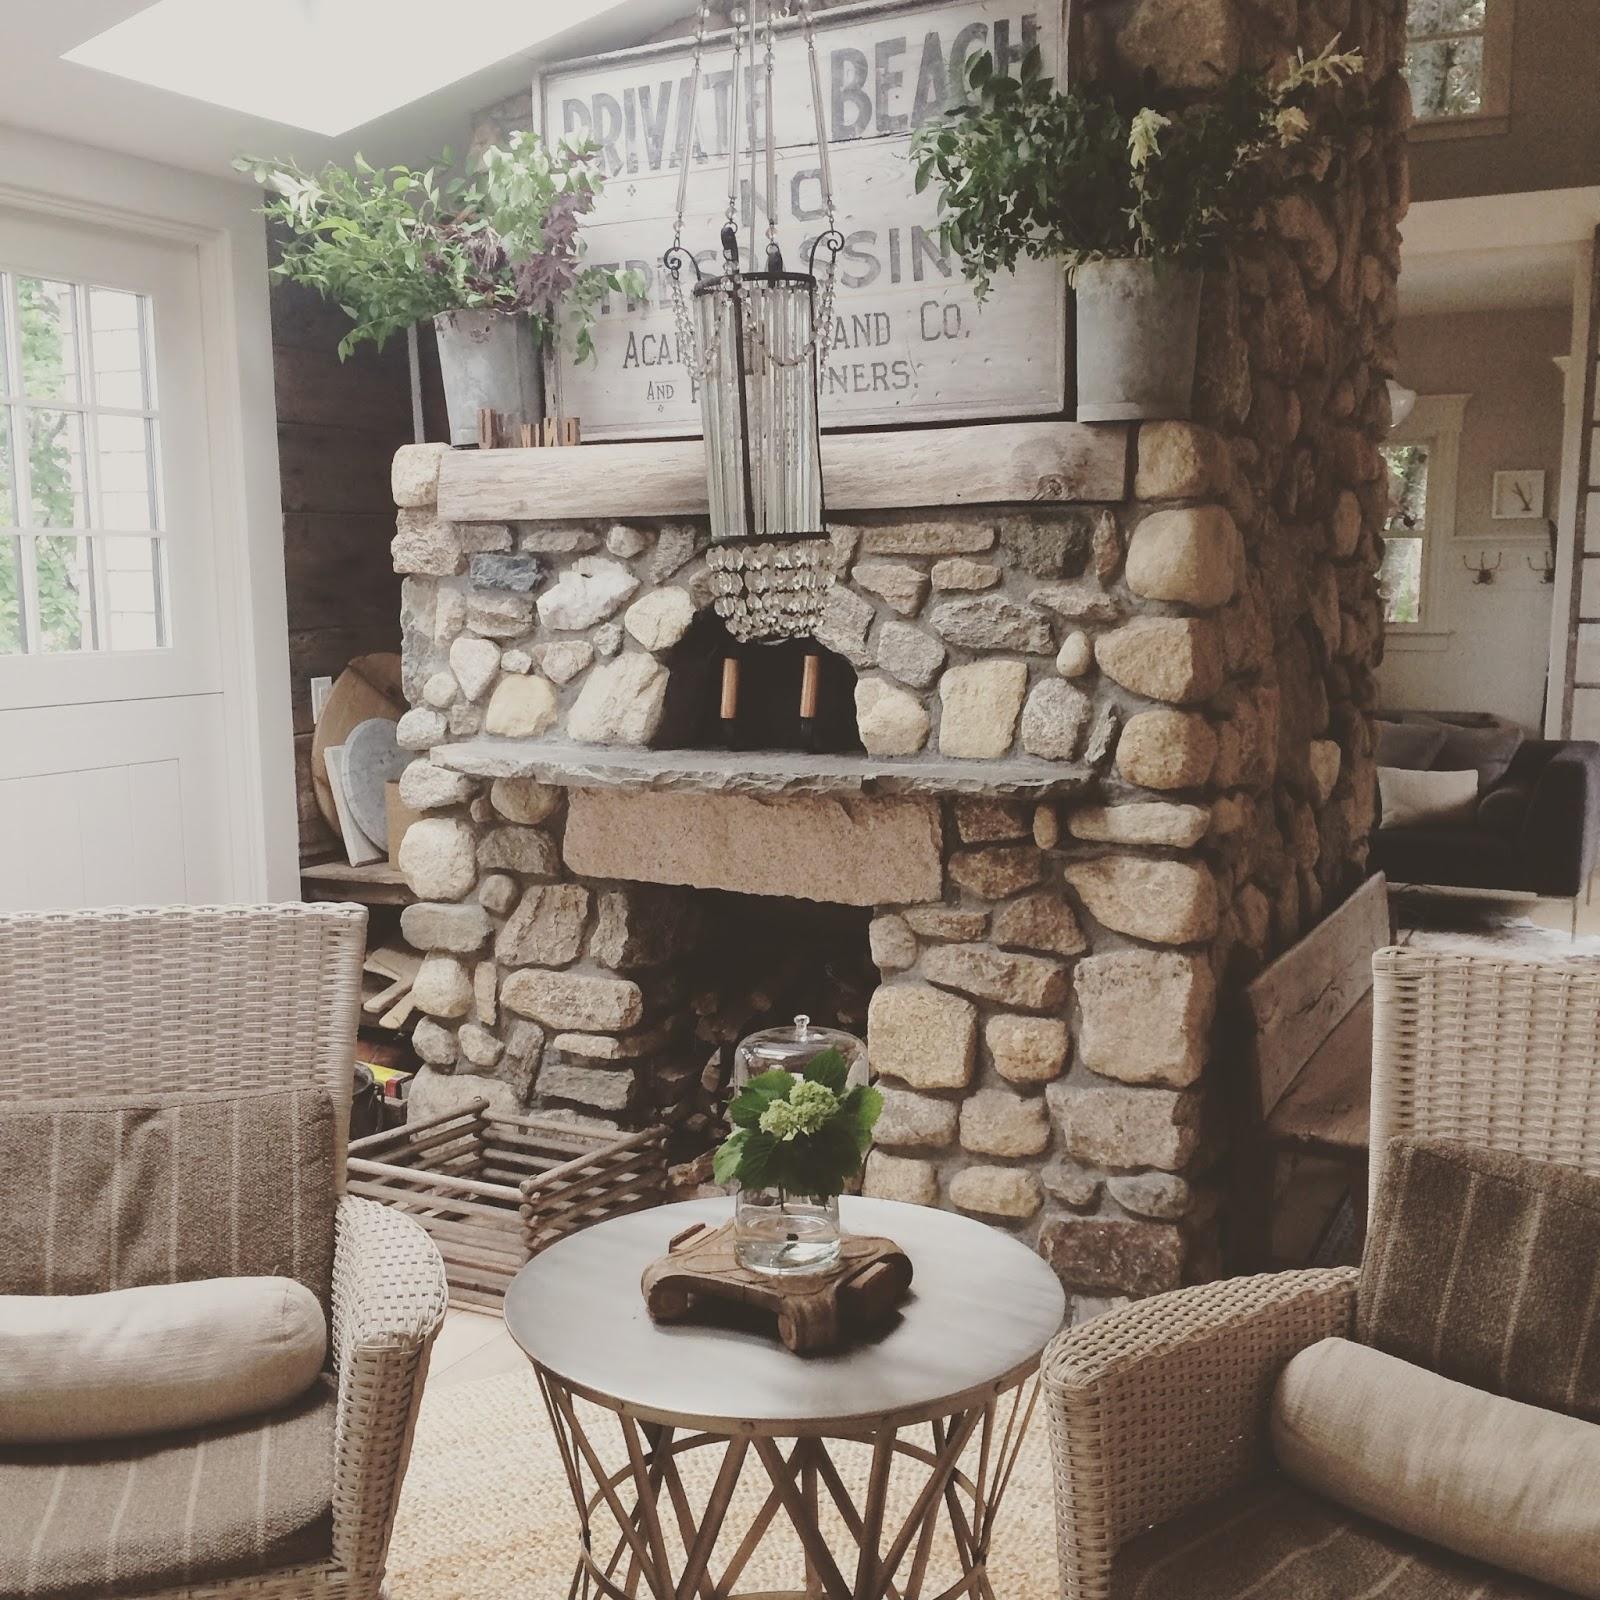 maison decor style alert vintage luxe mod rocks this shingle